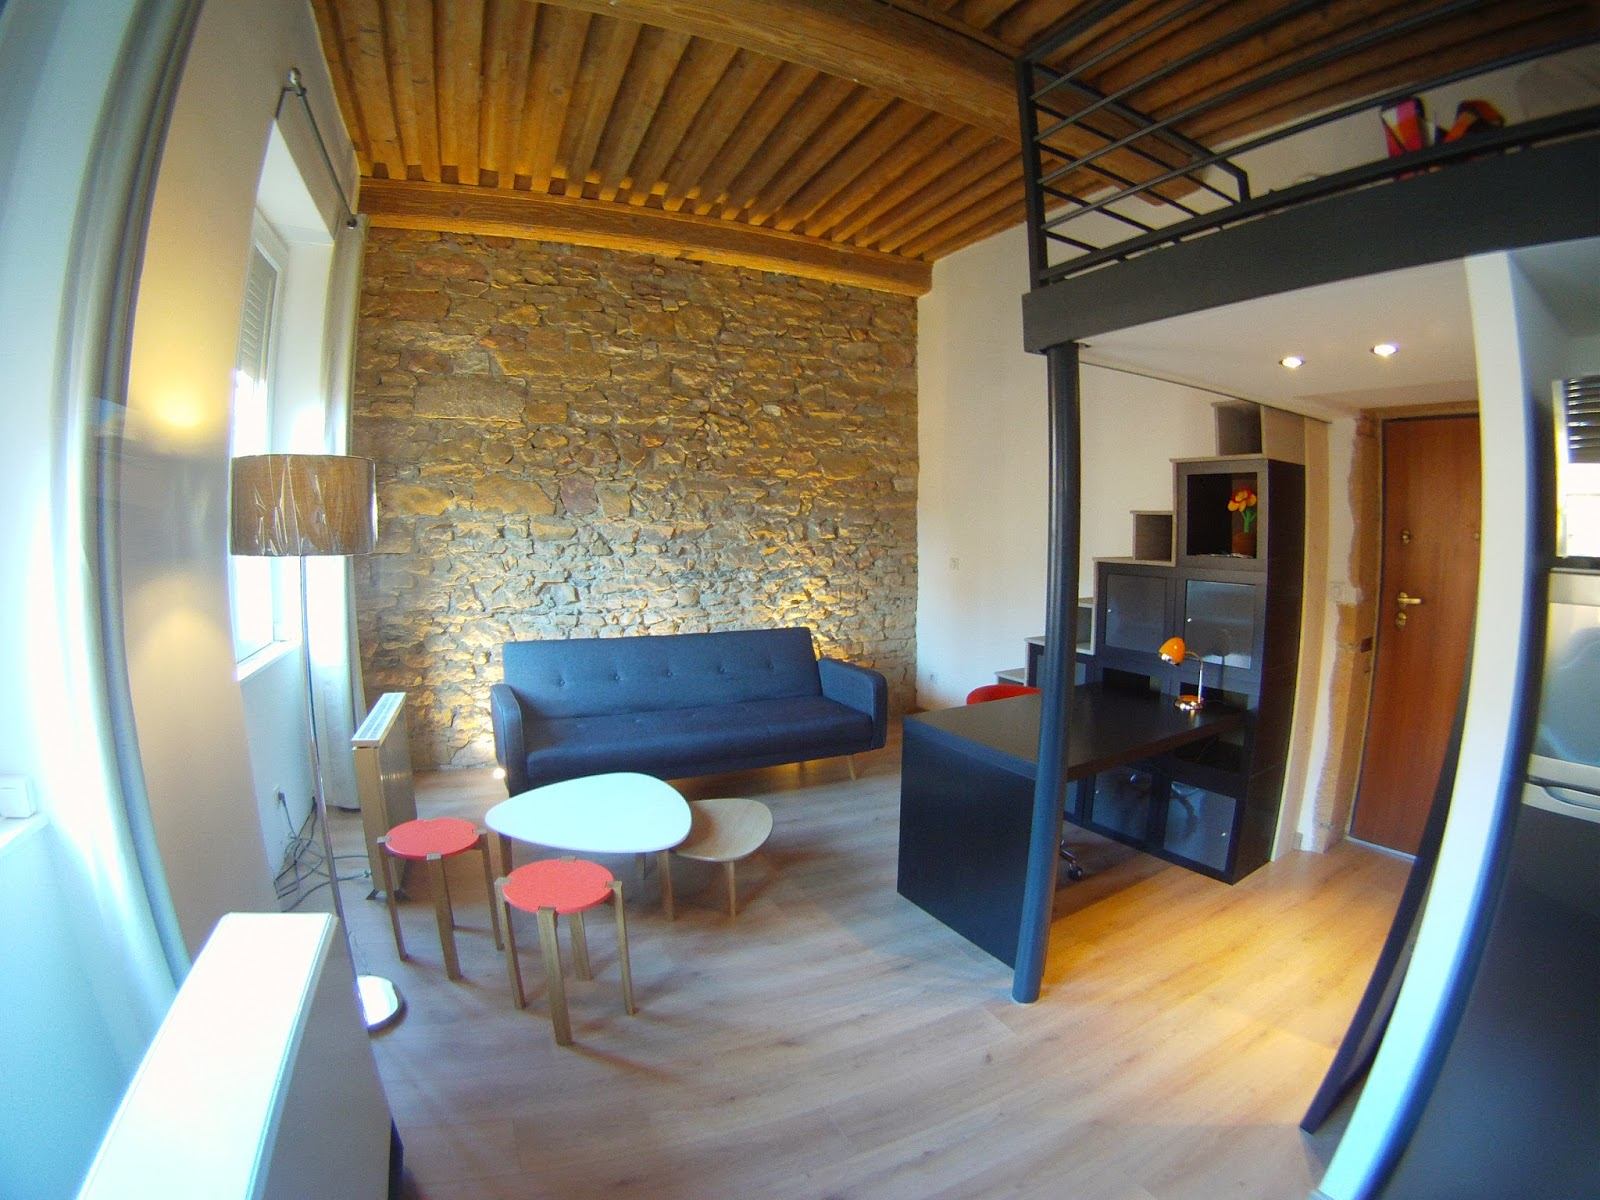 indoordesign architecture d 39 int rieur lyon dumenge 28m2 livr. Black Bedroom Furniture Sets. Home Design Ideas